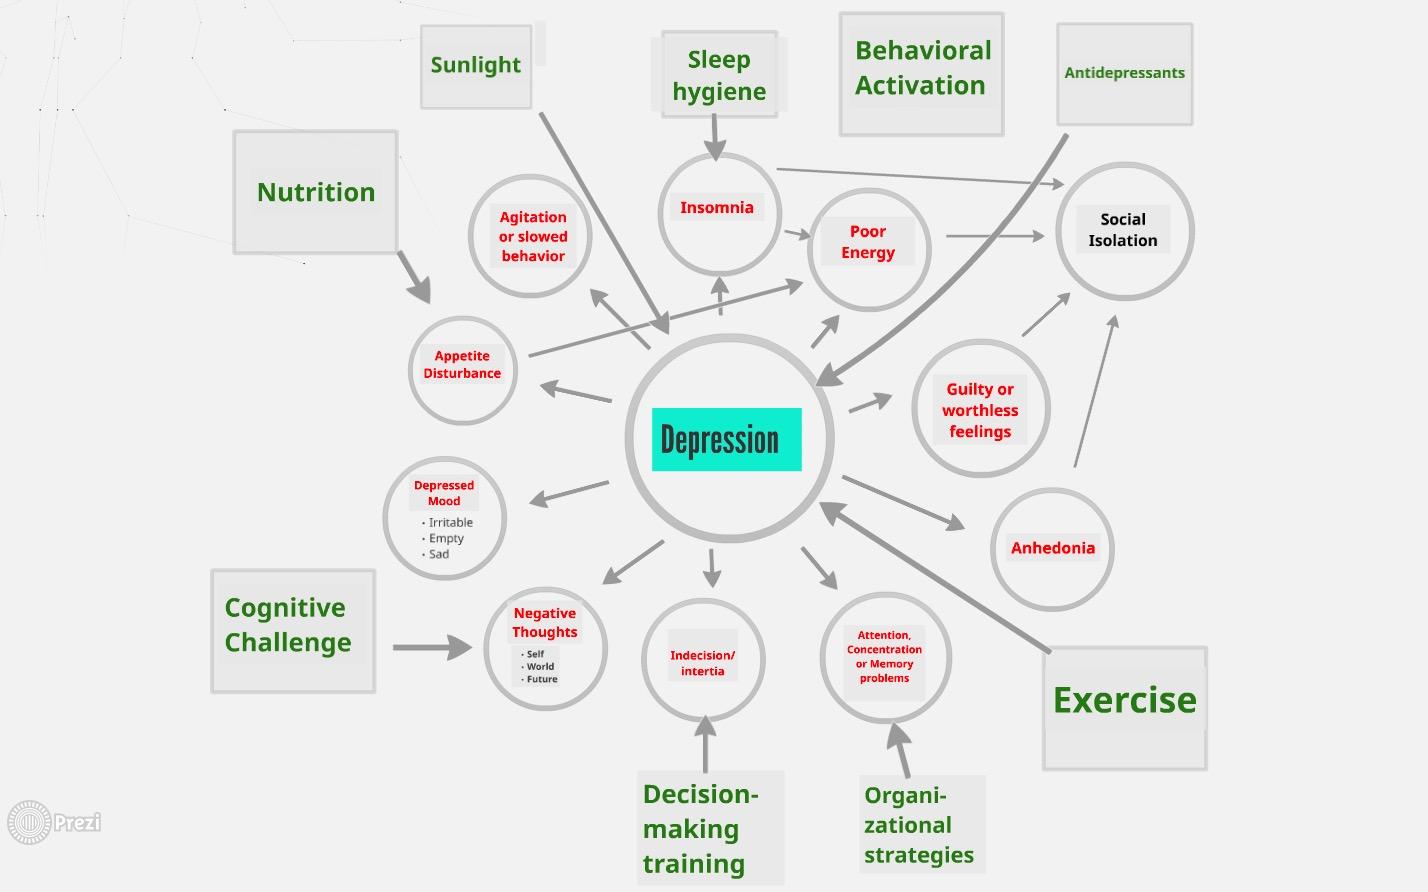 behavioural activation diagram